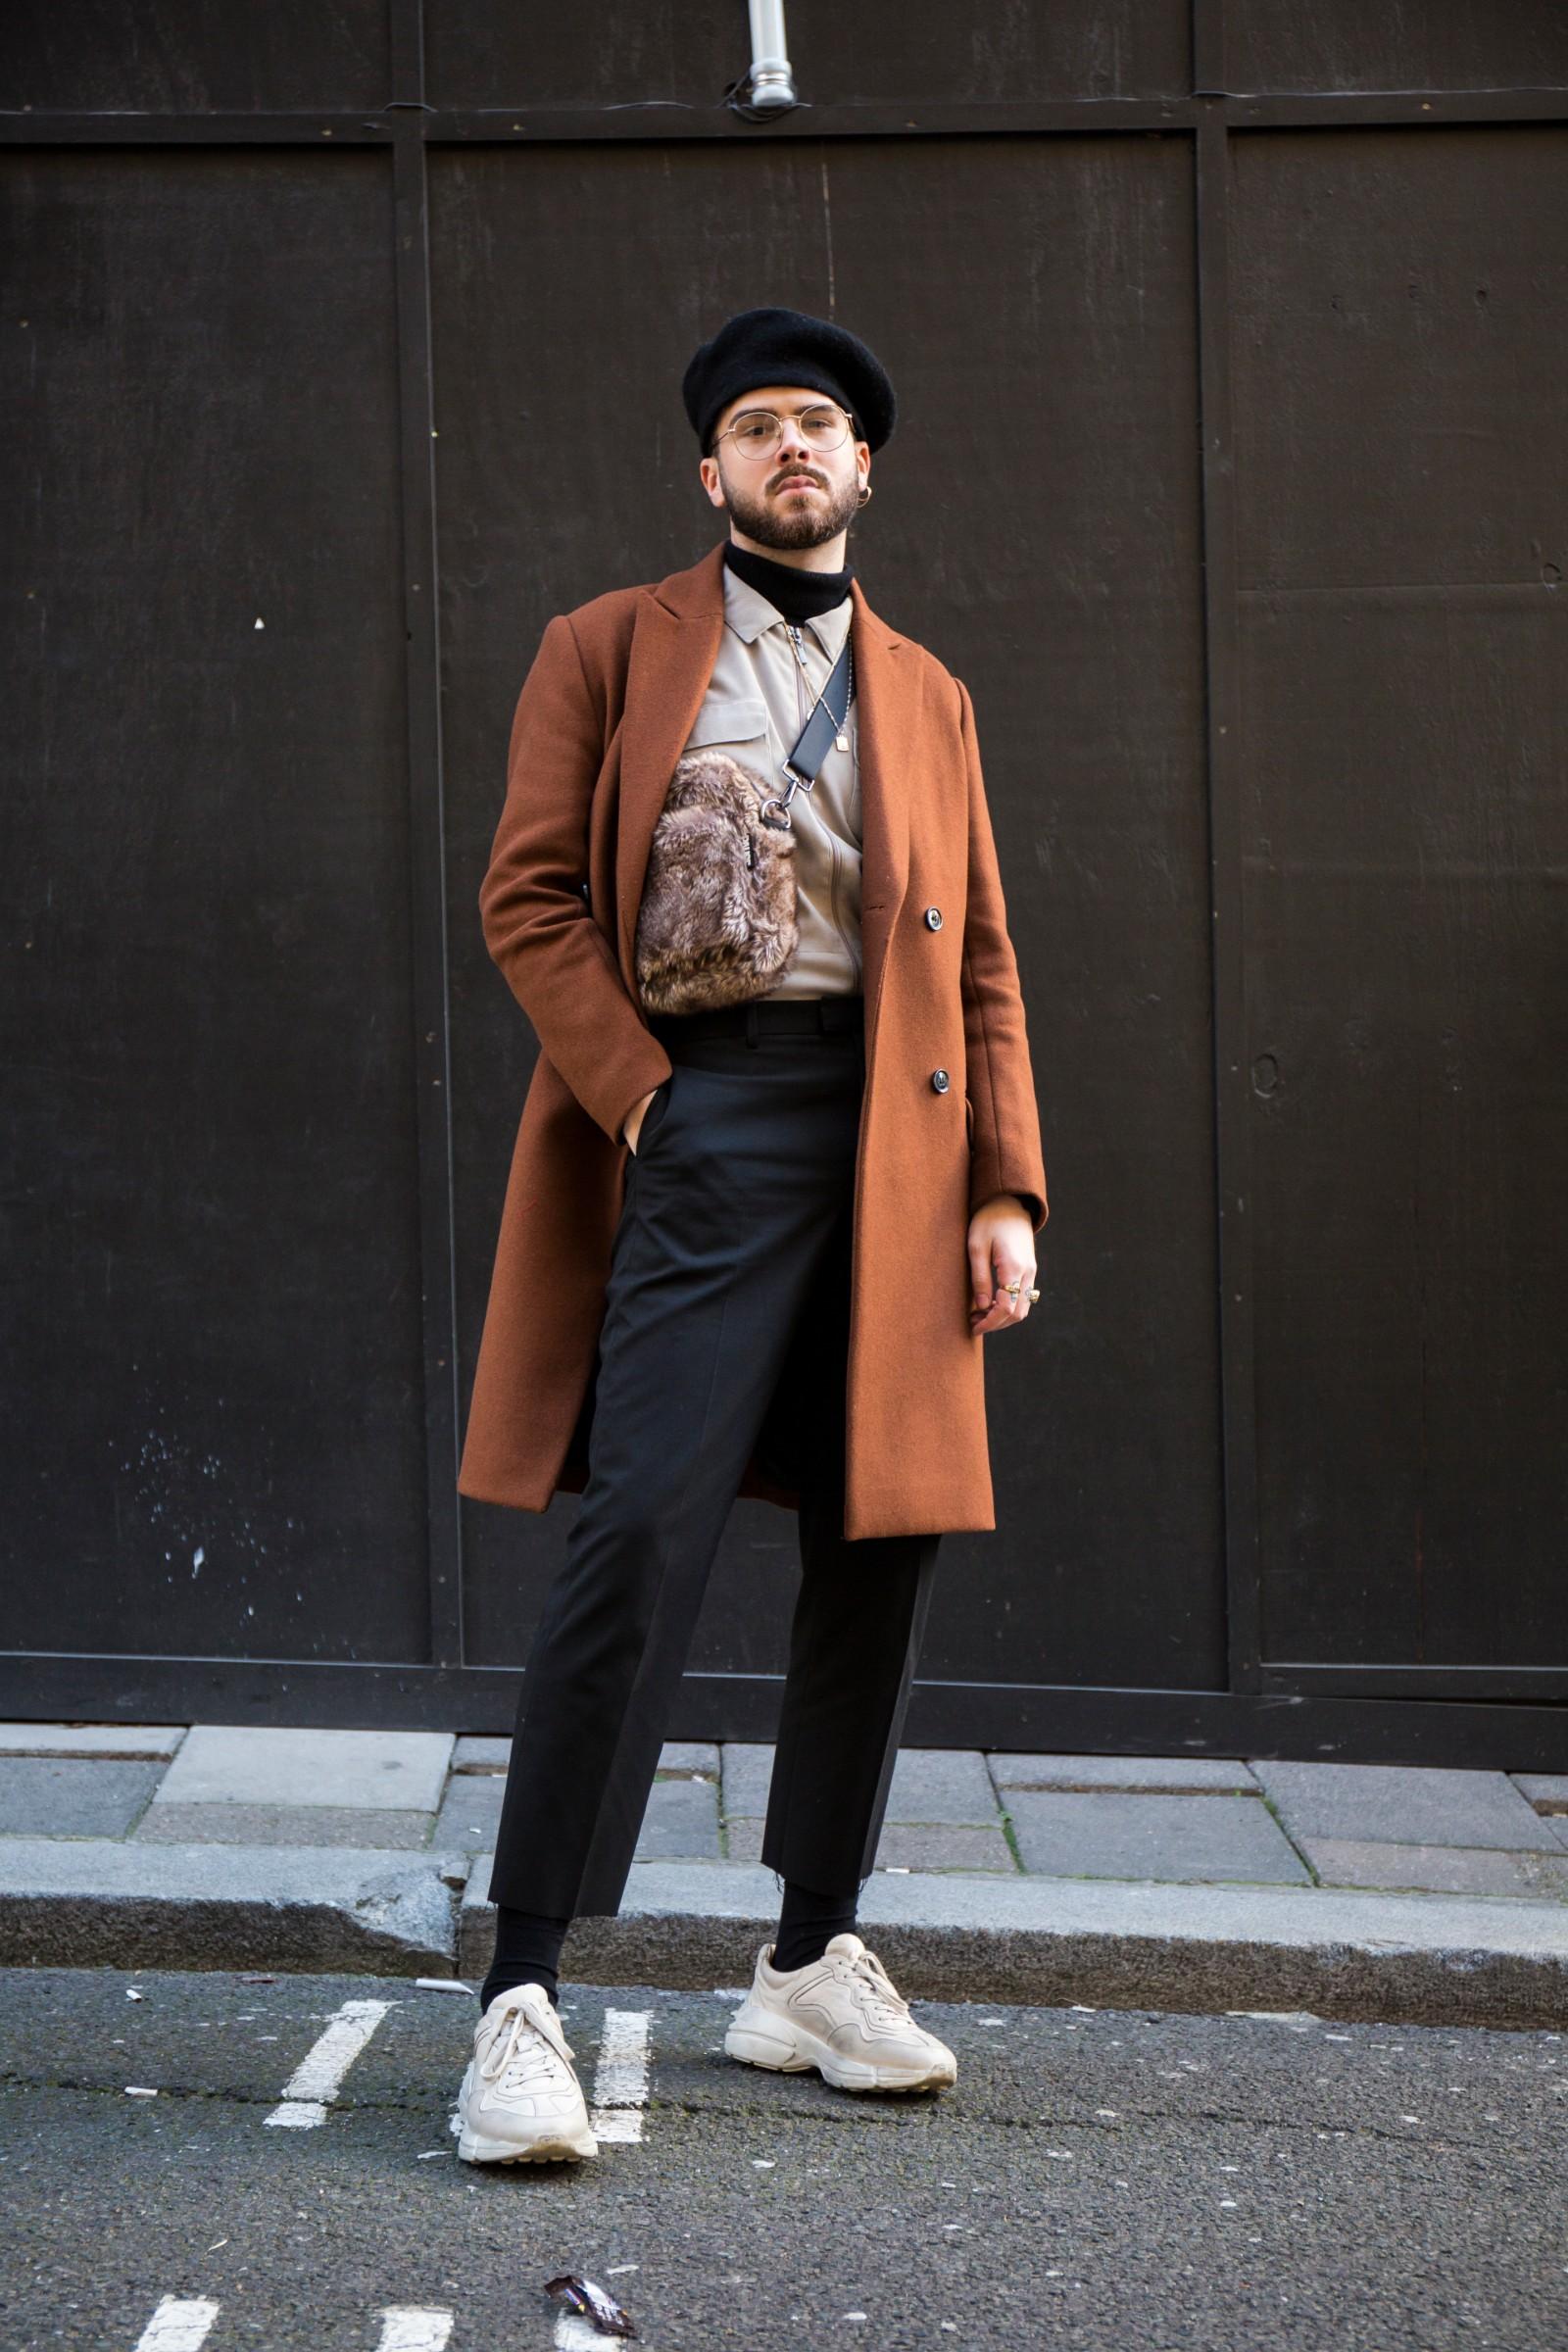 Street Style: London Fashion Week Feb 2018 Part 1